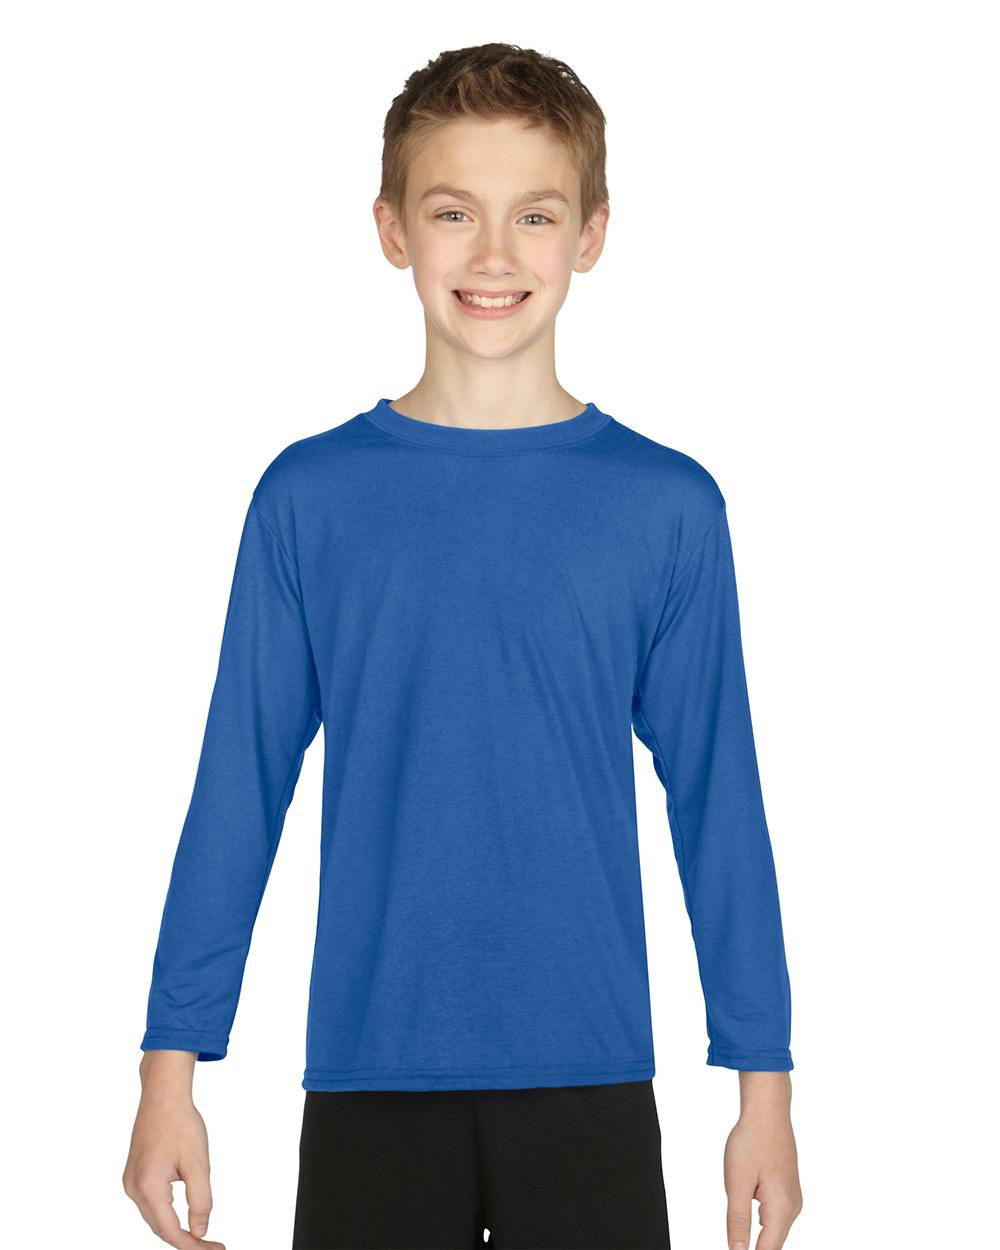 Gildan 42400B     Youth Long Sleeve Performance    4.5 oz. 100% Polyester (Cotton Feel)